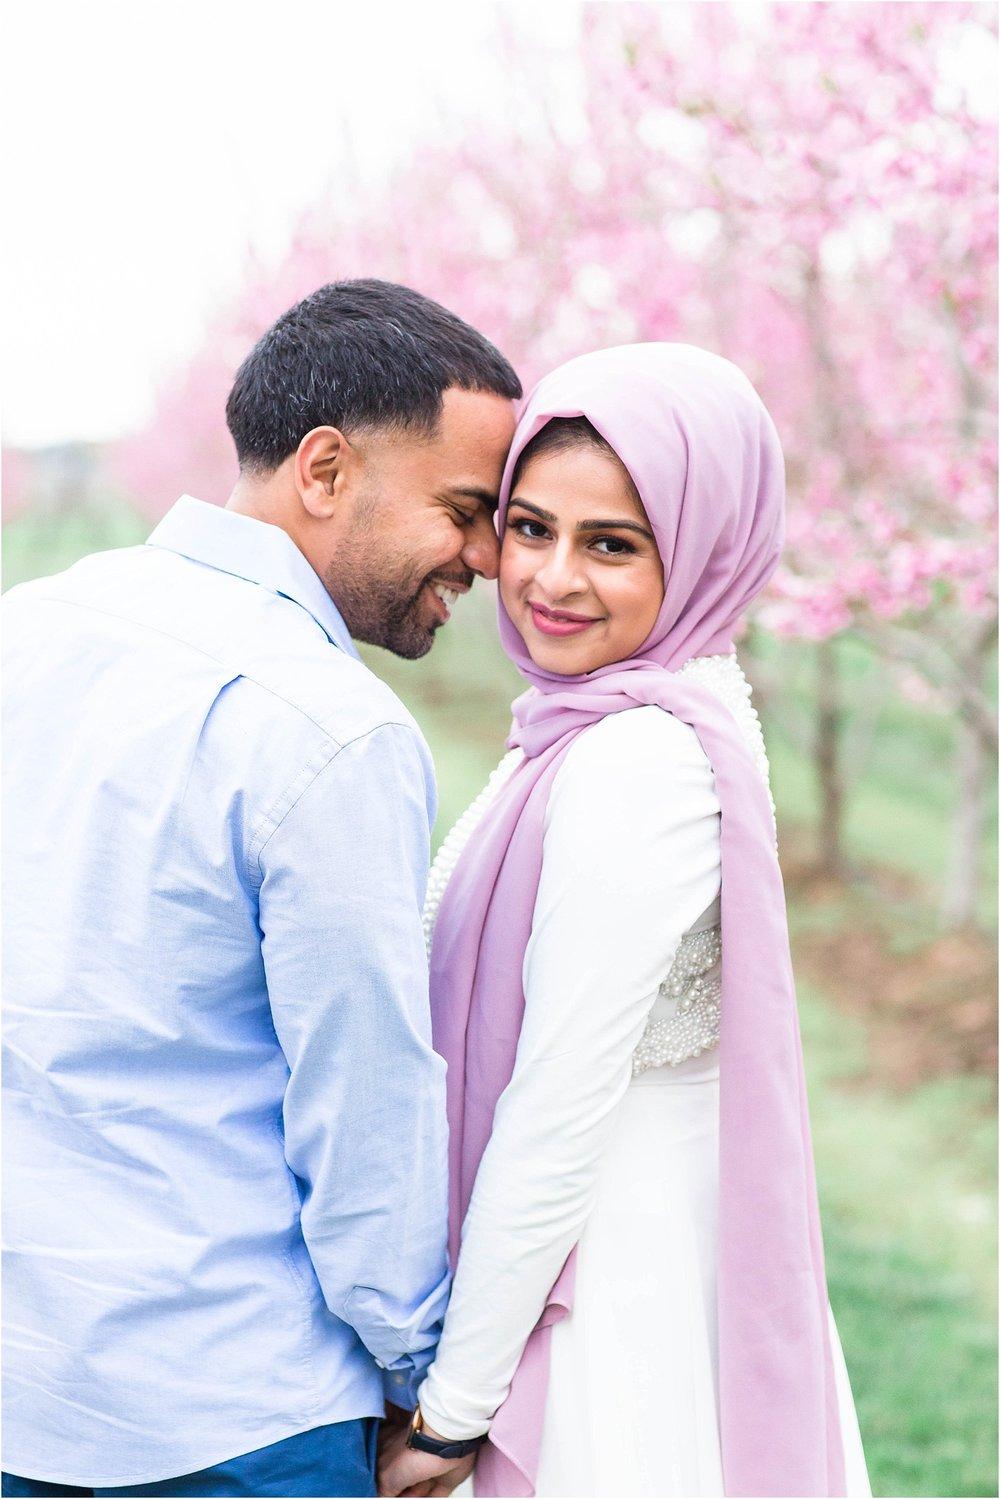 Niagara-on-the-lake-cherry-blossom-farm-Engagement-Session-Toronto-Mississauga-Brampton-Scarborough-GTA-Pakistani-Indian-Wedding-Engagement-Photographer-Photography_0017.jpg